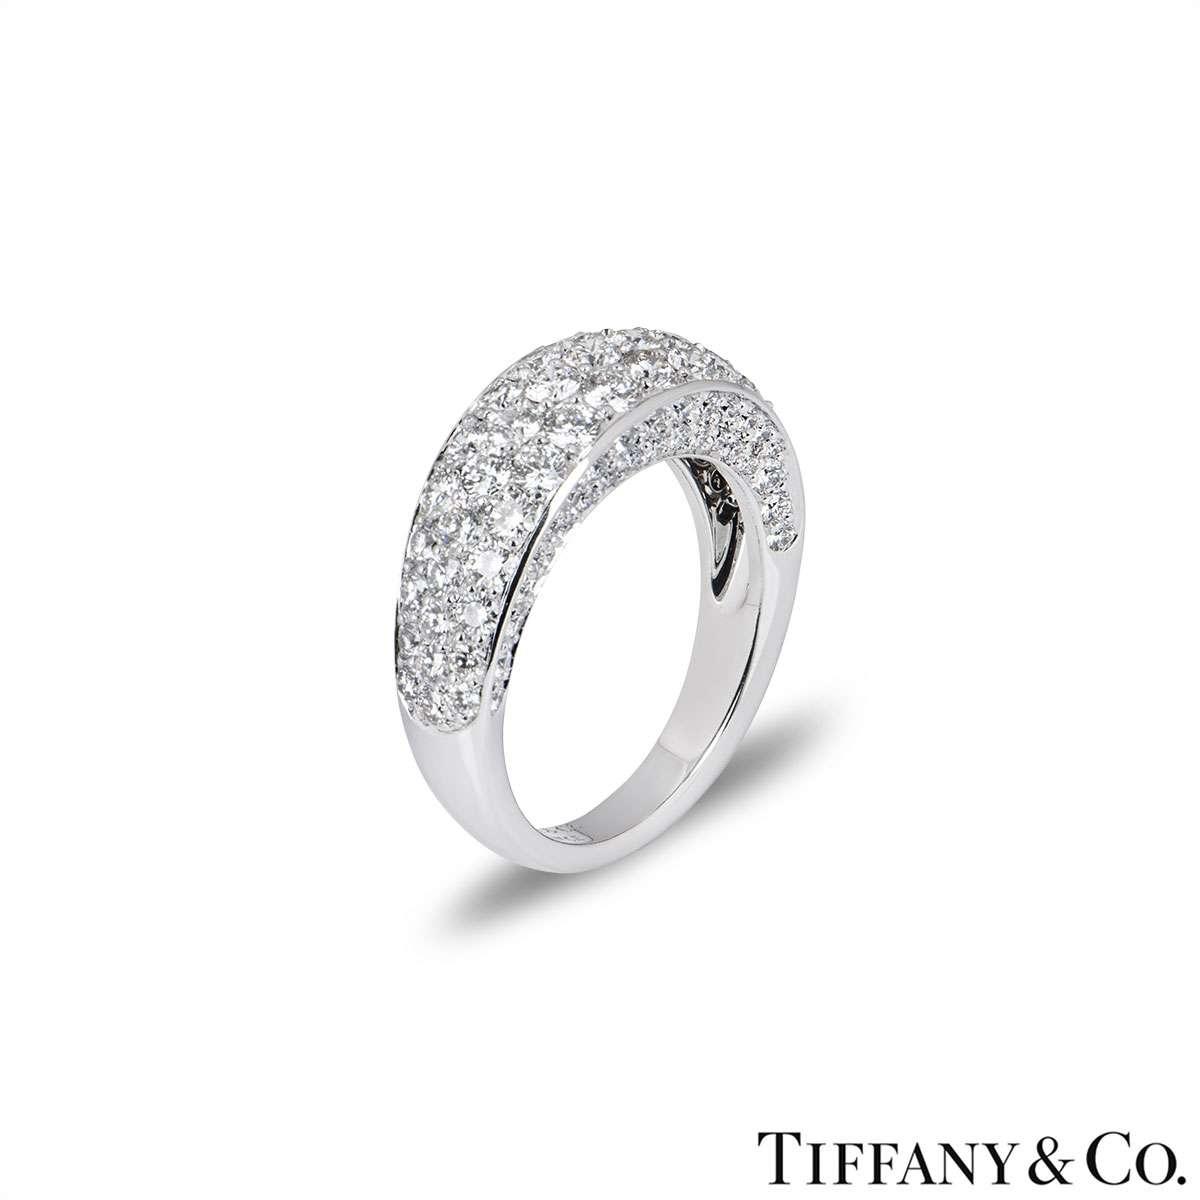 Tiffany & Co. White Gold Pave Diamond Ring